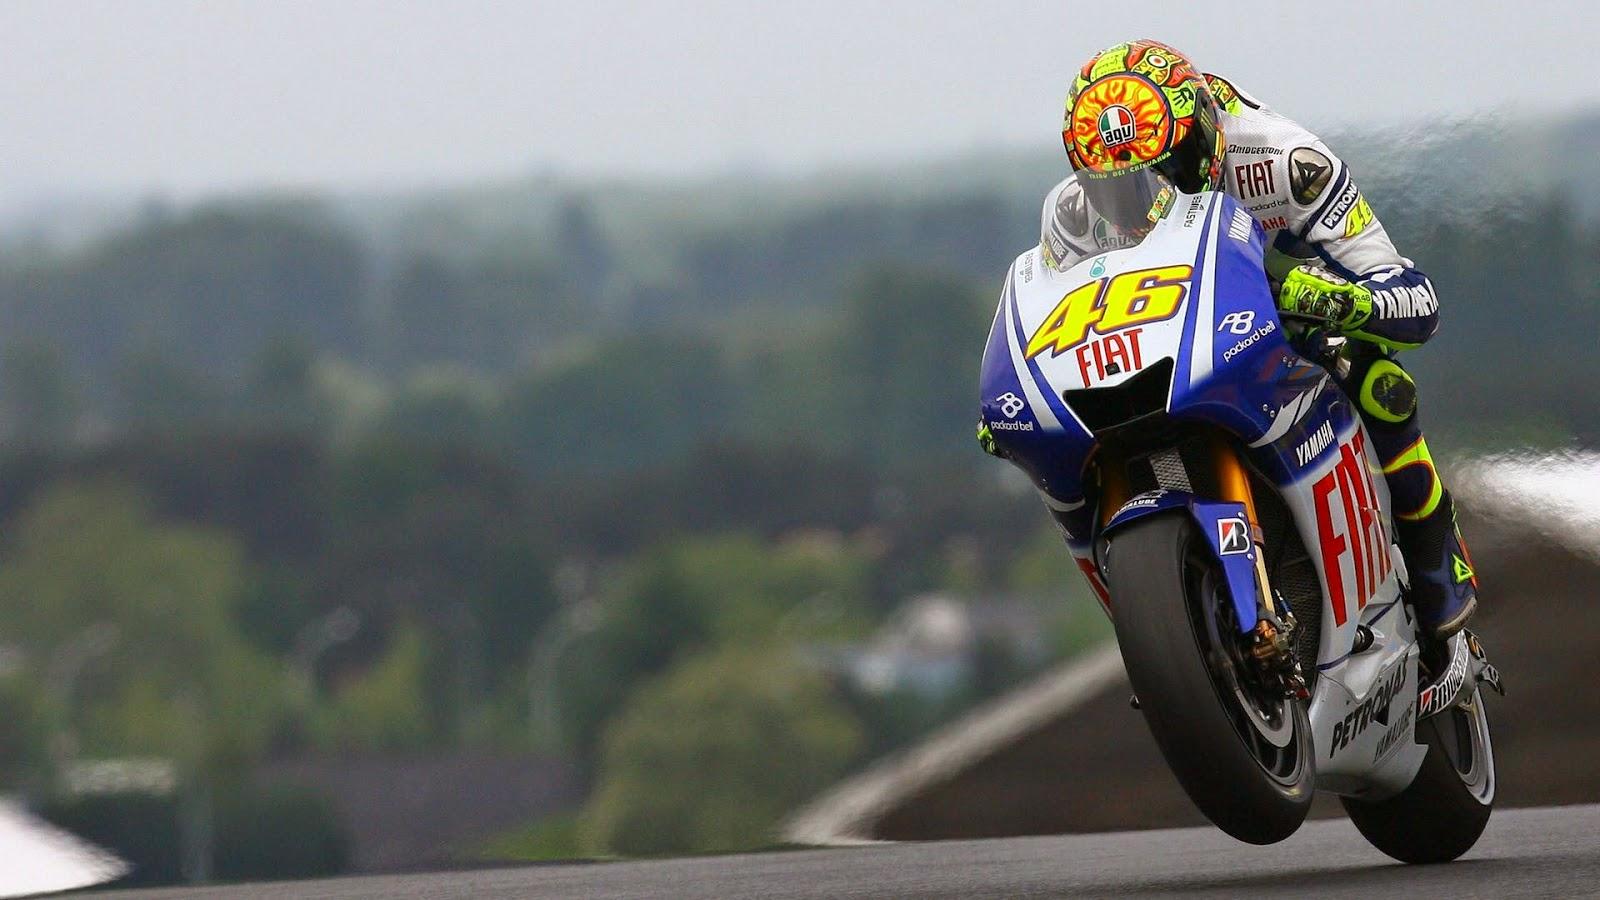 Valentino Rossi Yamaha Wallpaper HD   Walpaperes 1600x900